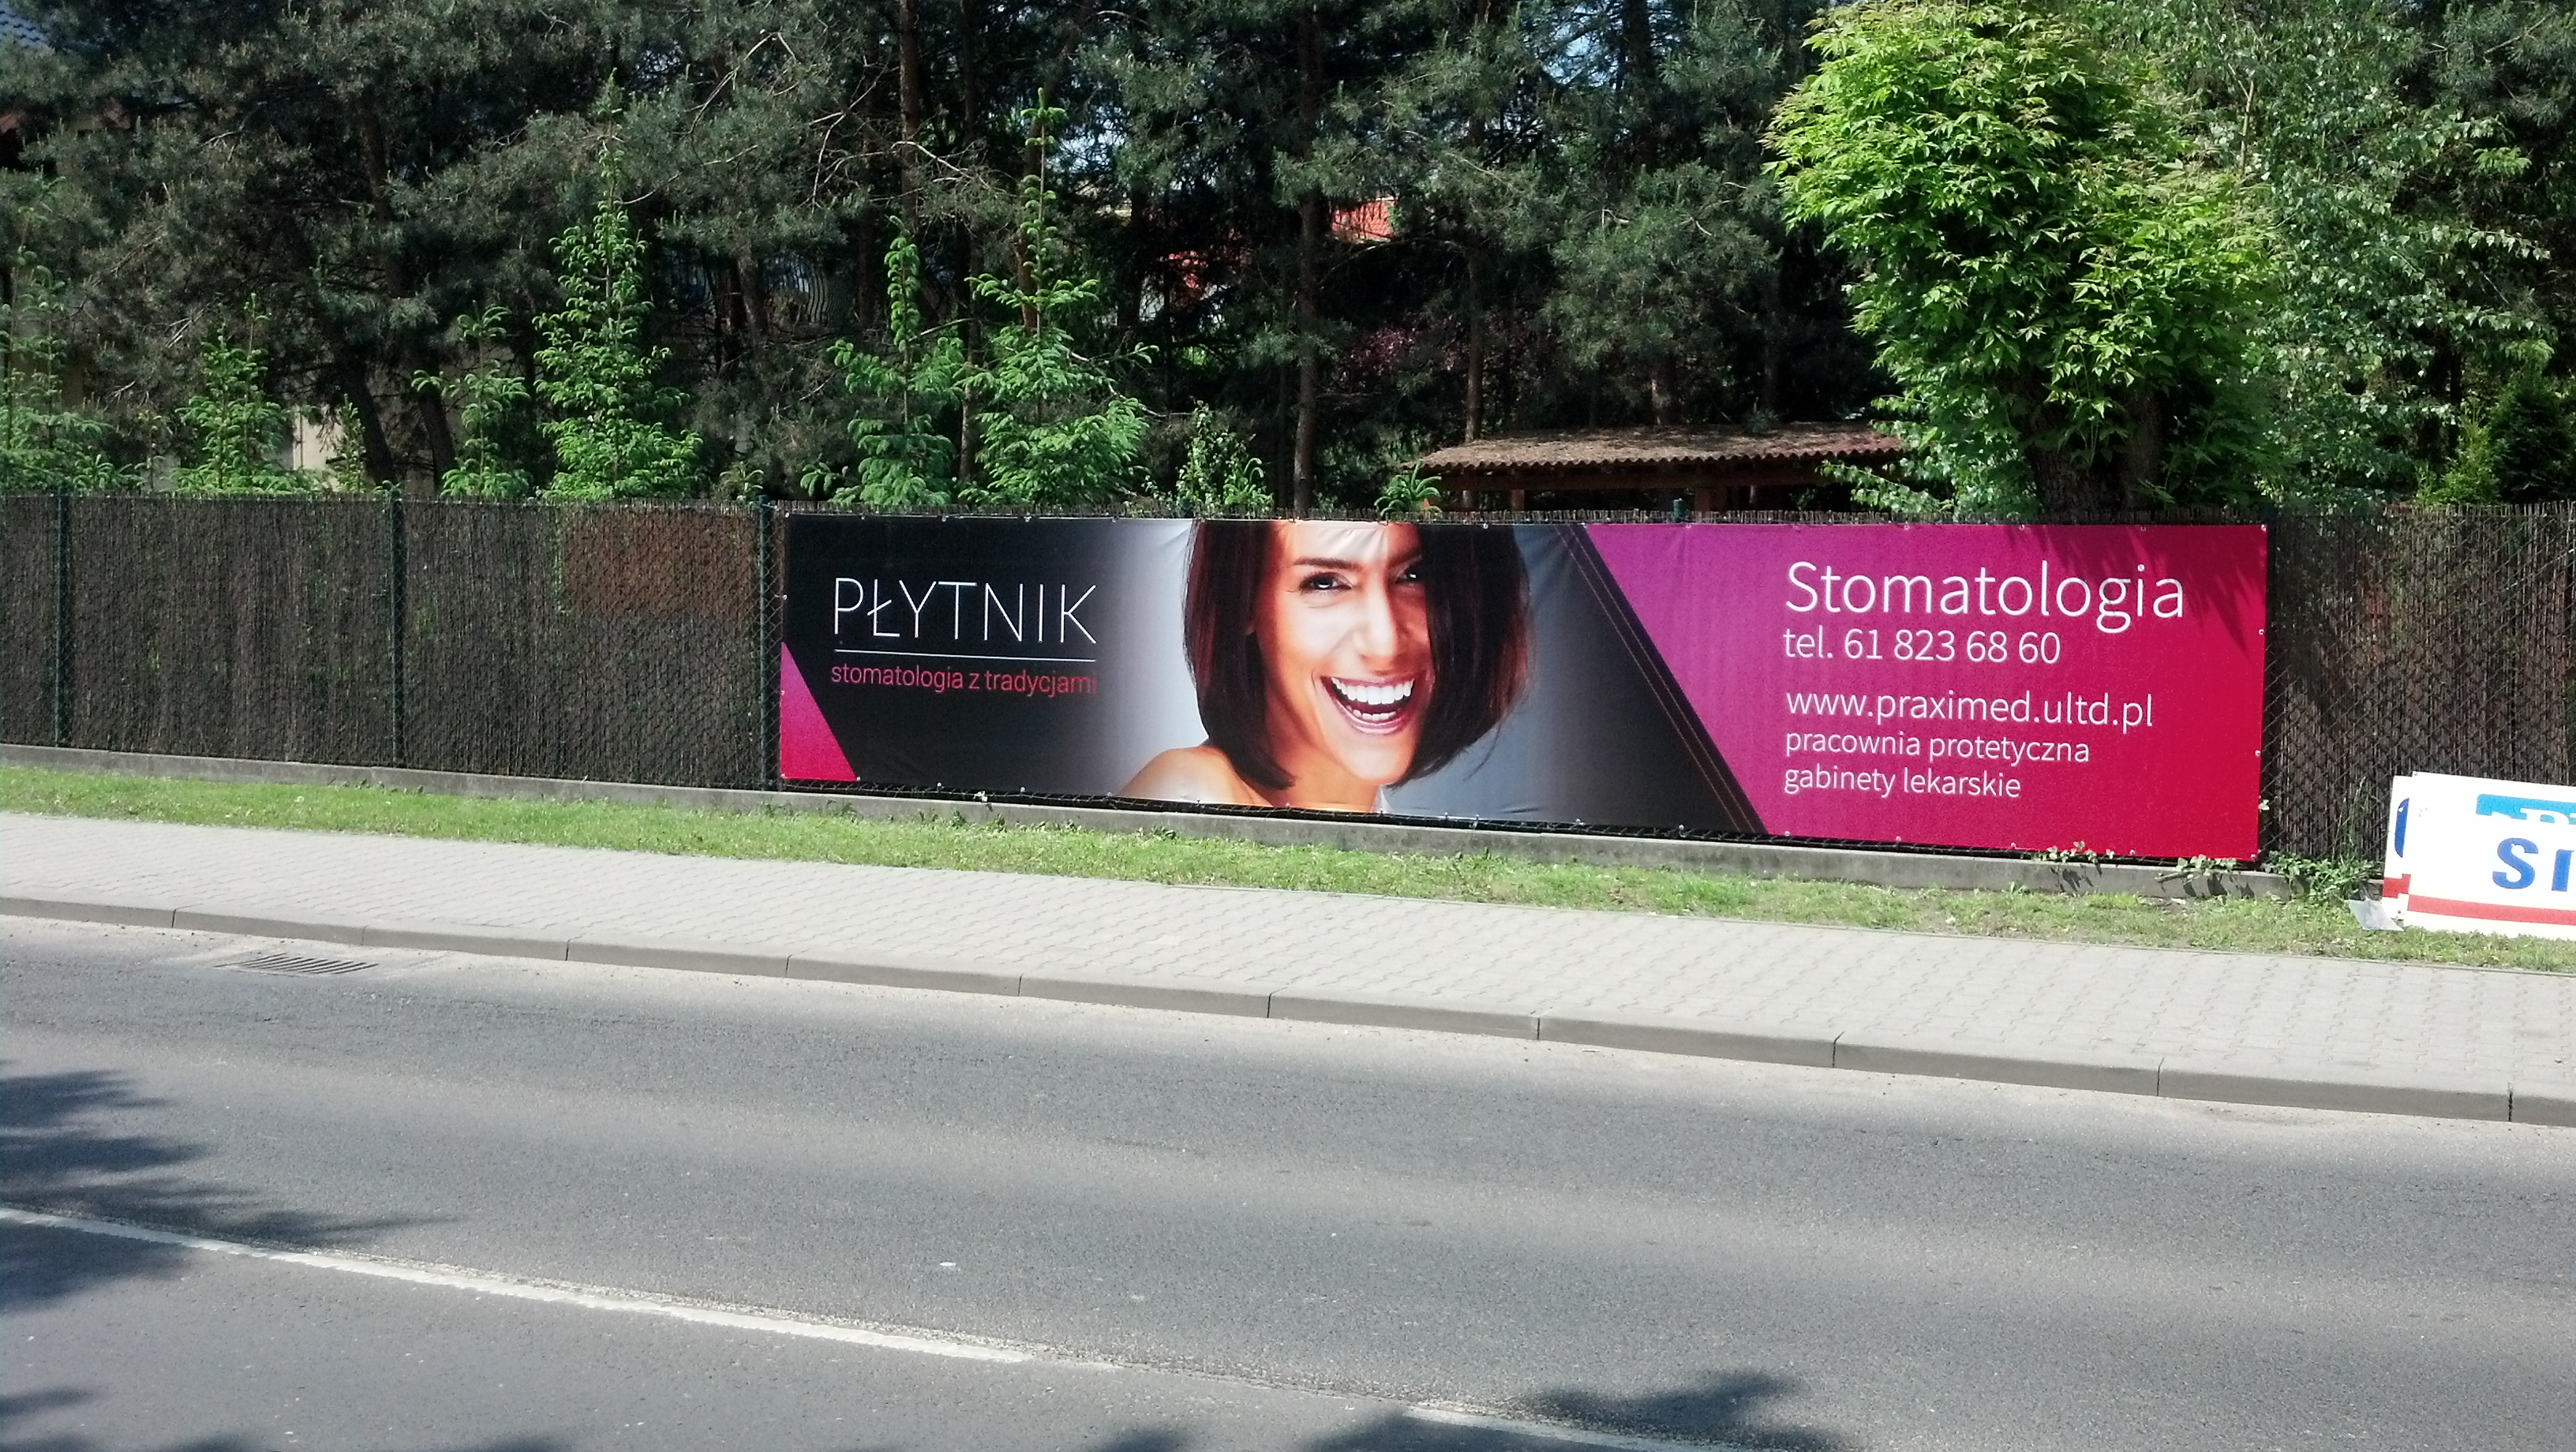 Reklama Płytnik Stomatolog